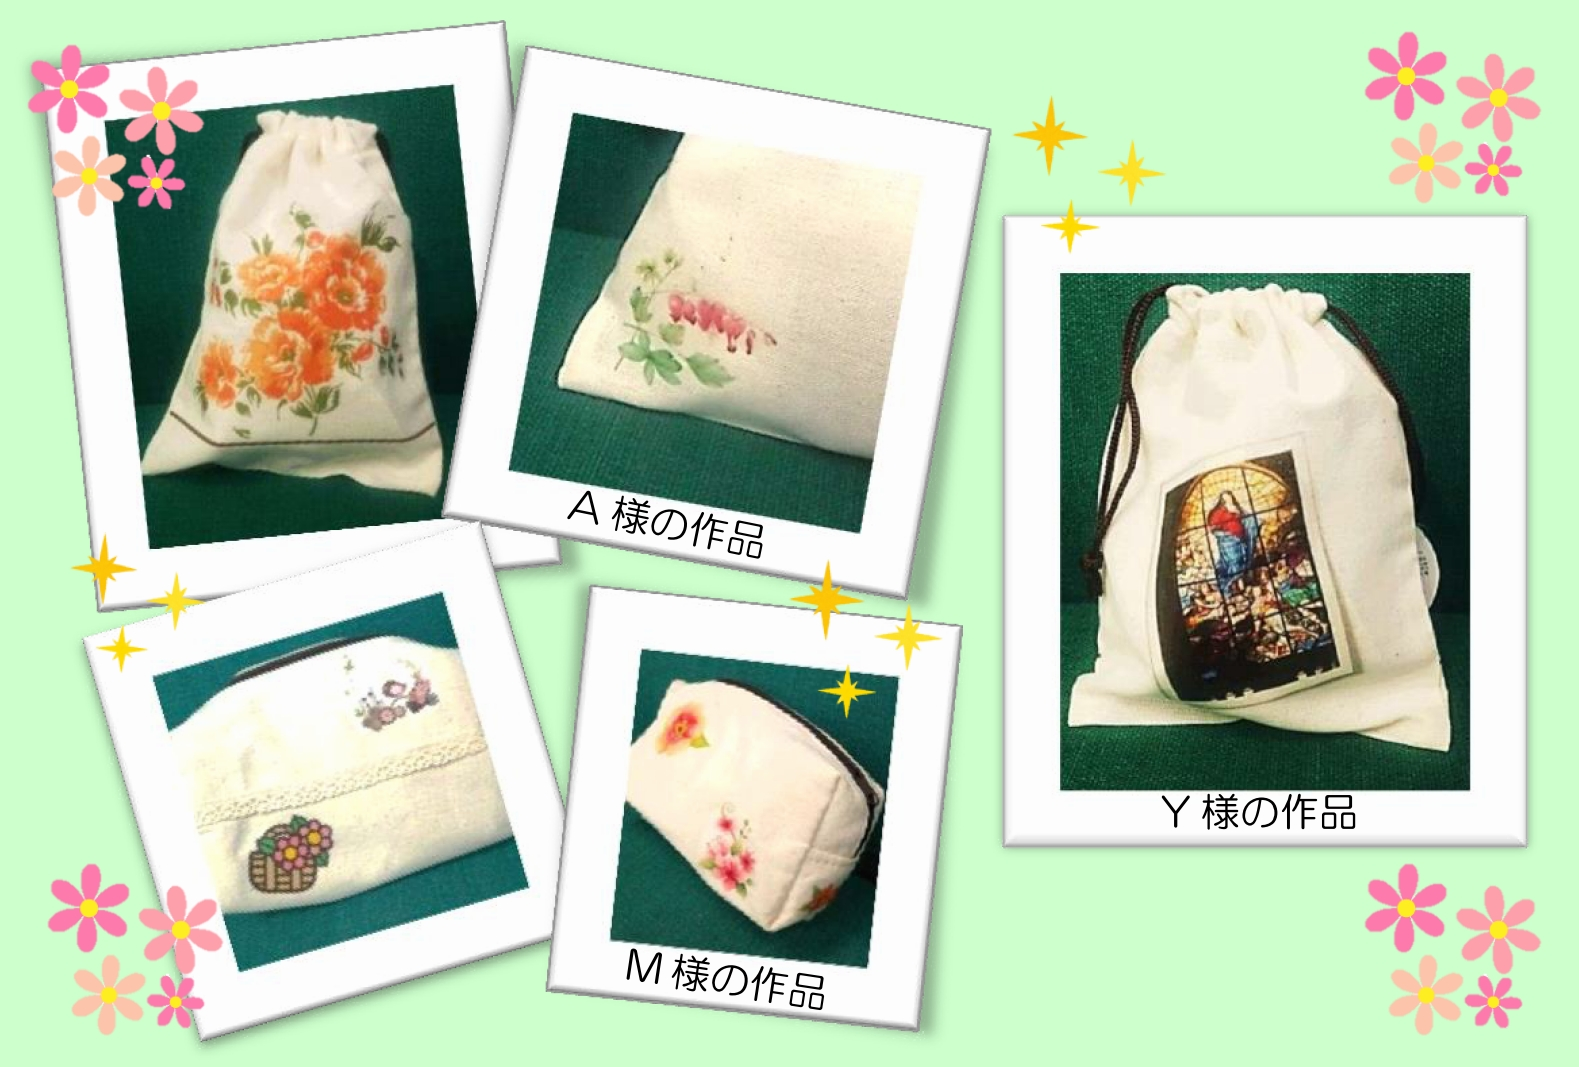 gifu_sakuhin_airon_2.jpg